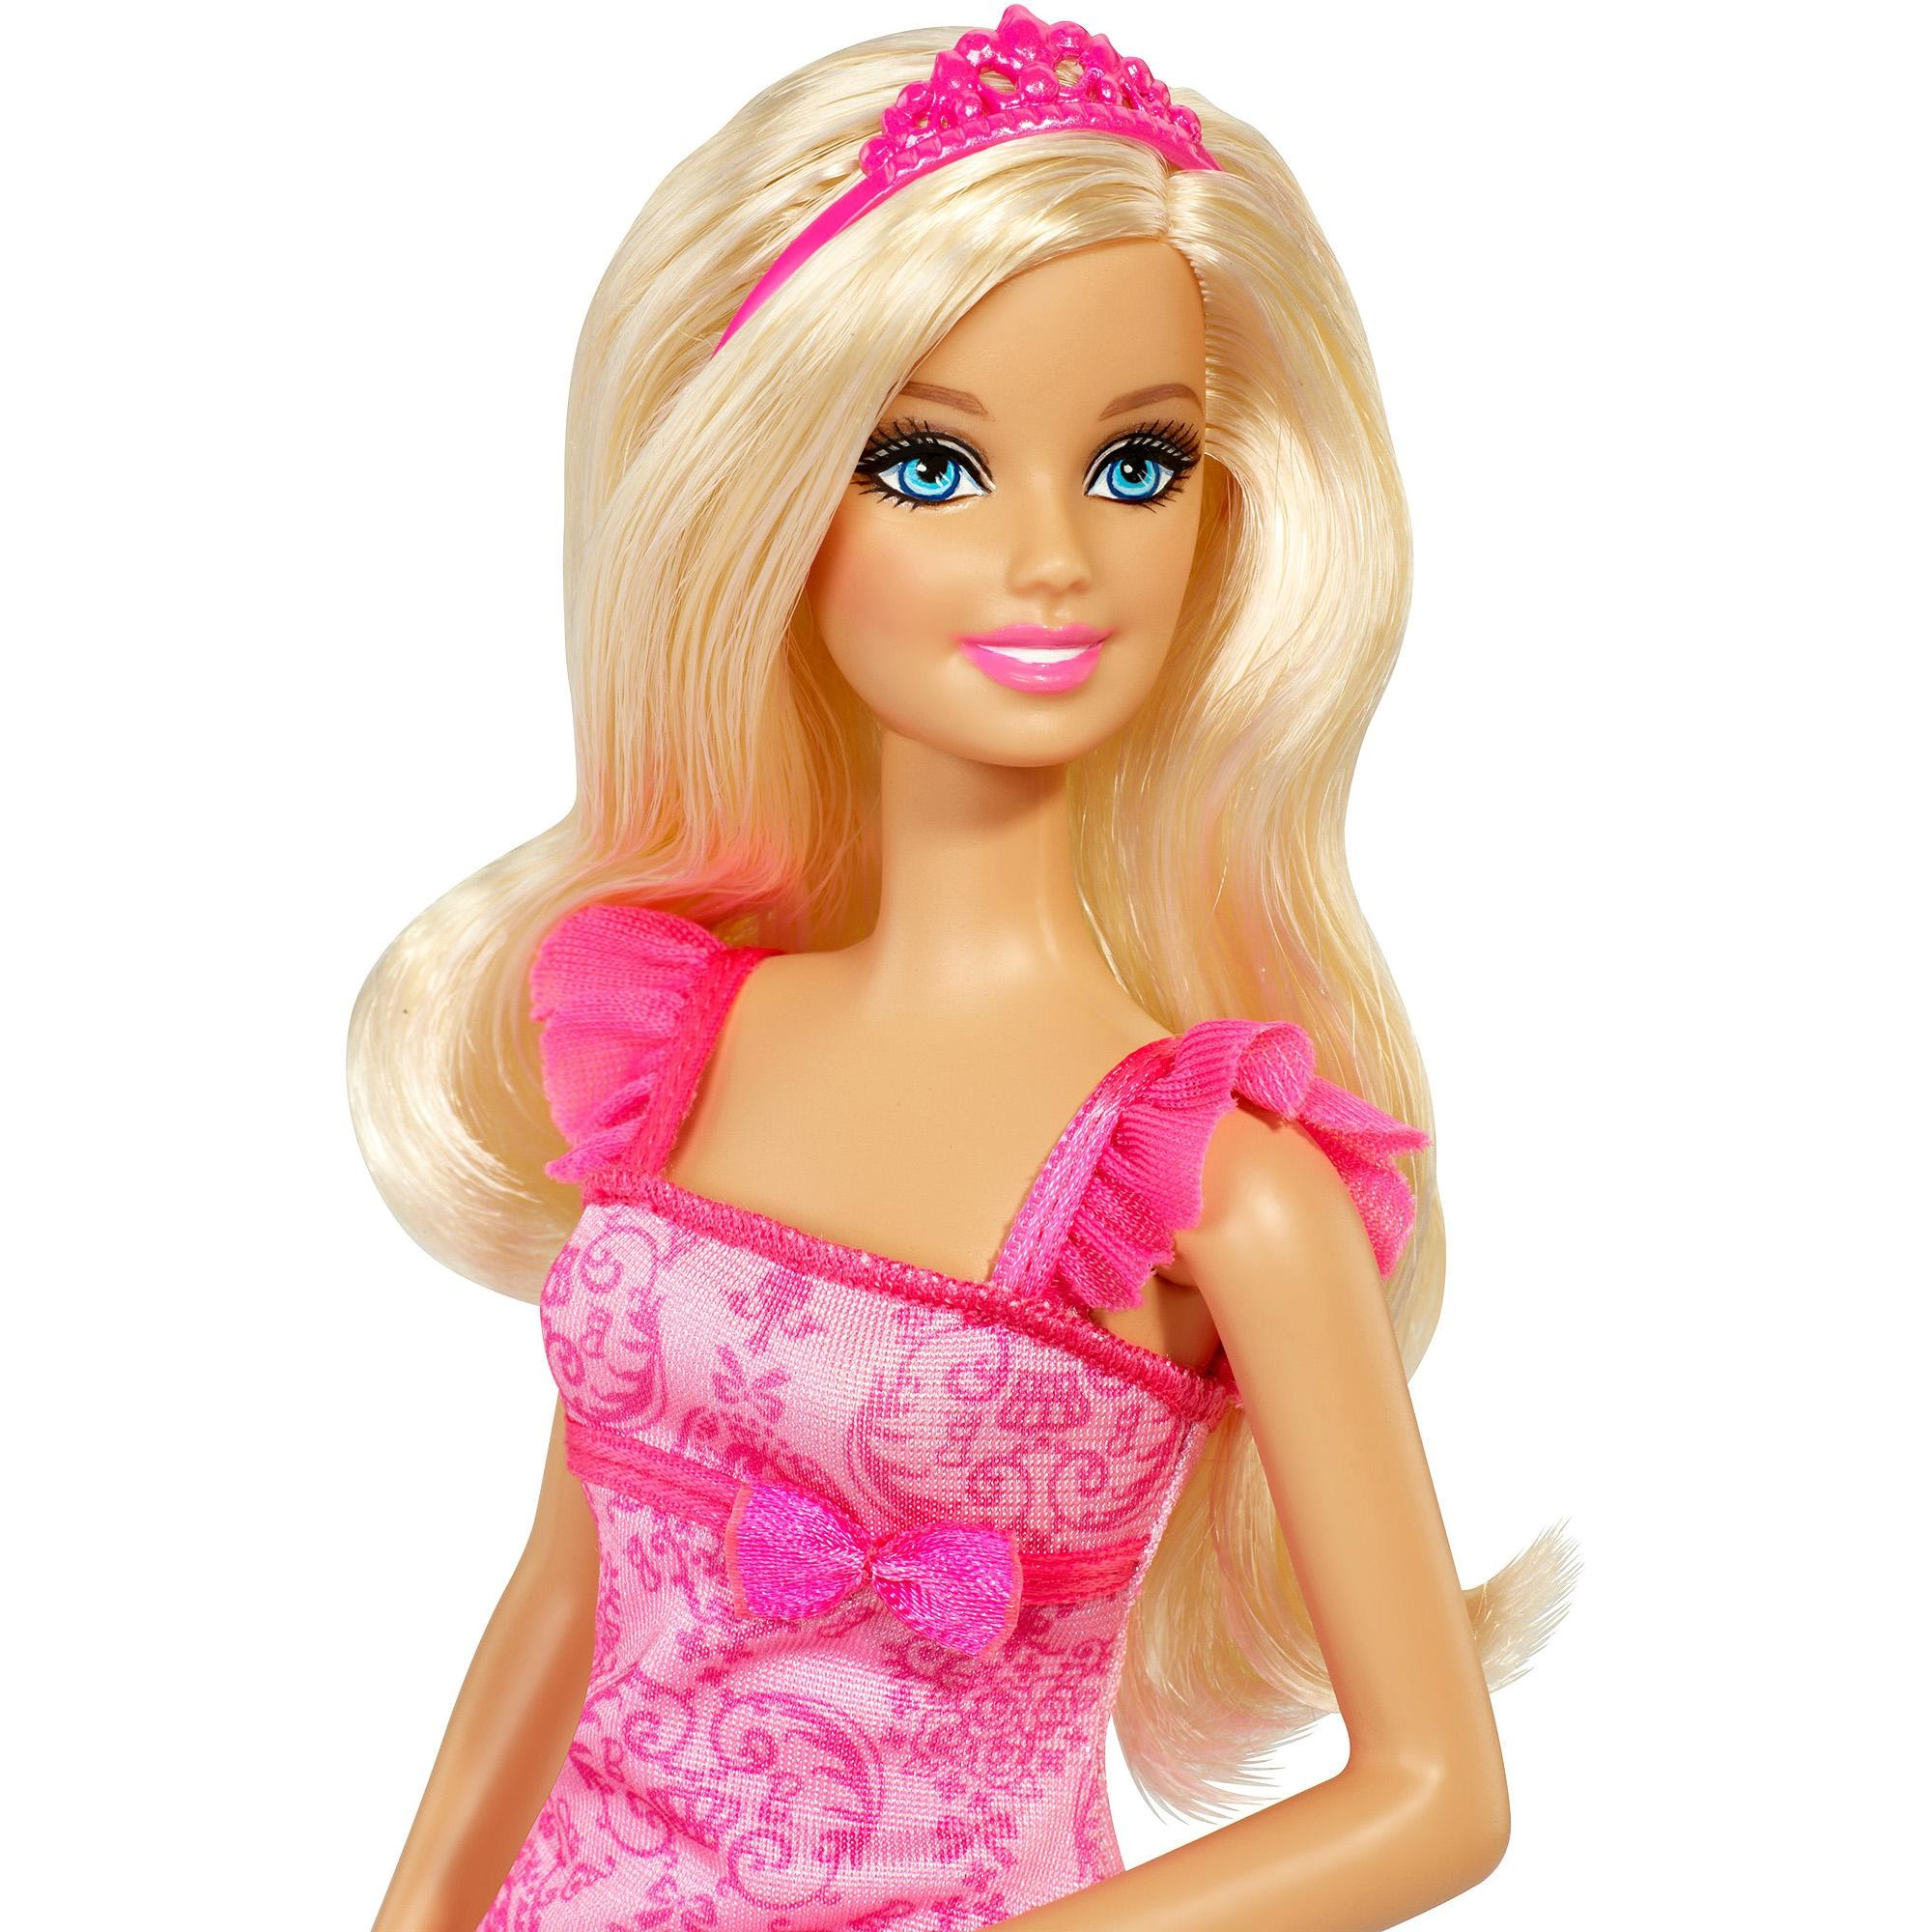 Barbie Wallpaper Hd 3d: Barbie Screensavers Wallpapers (73+ Images